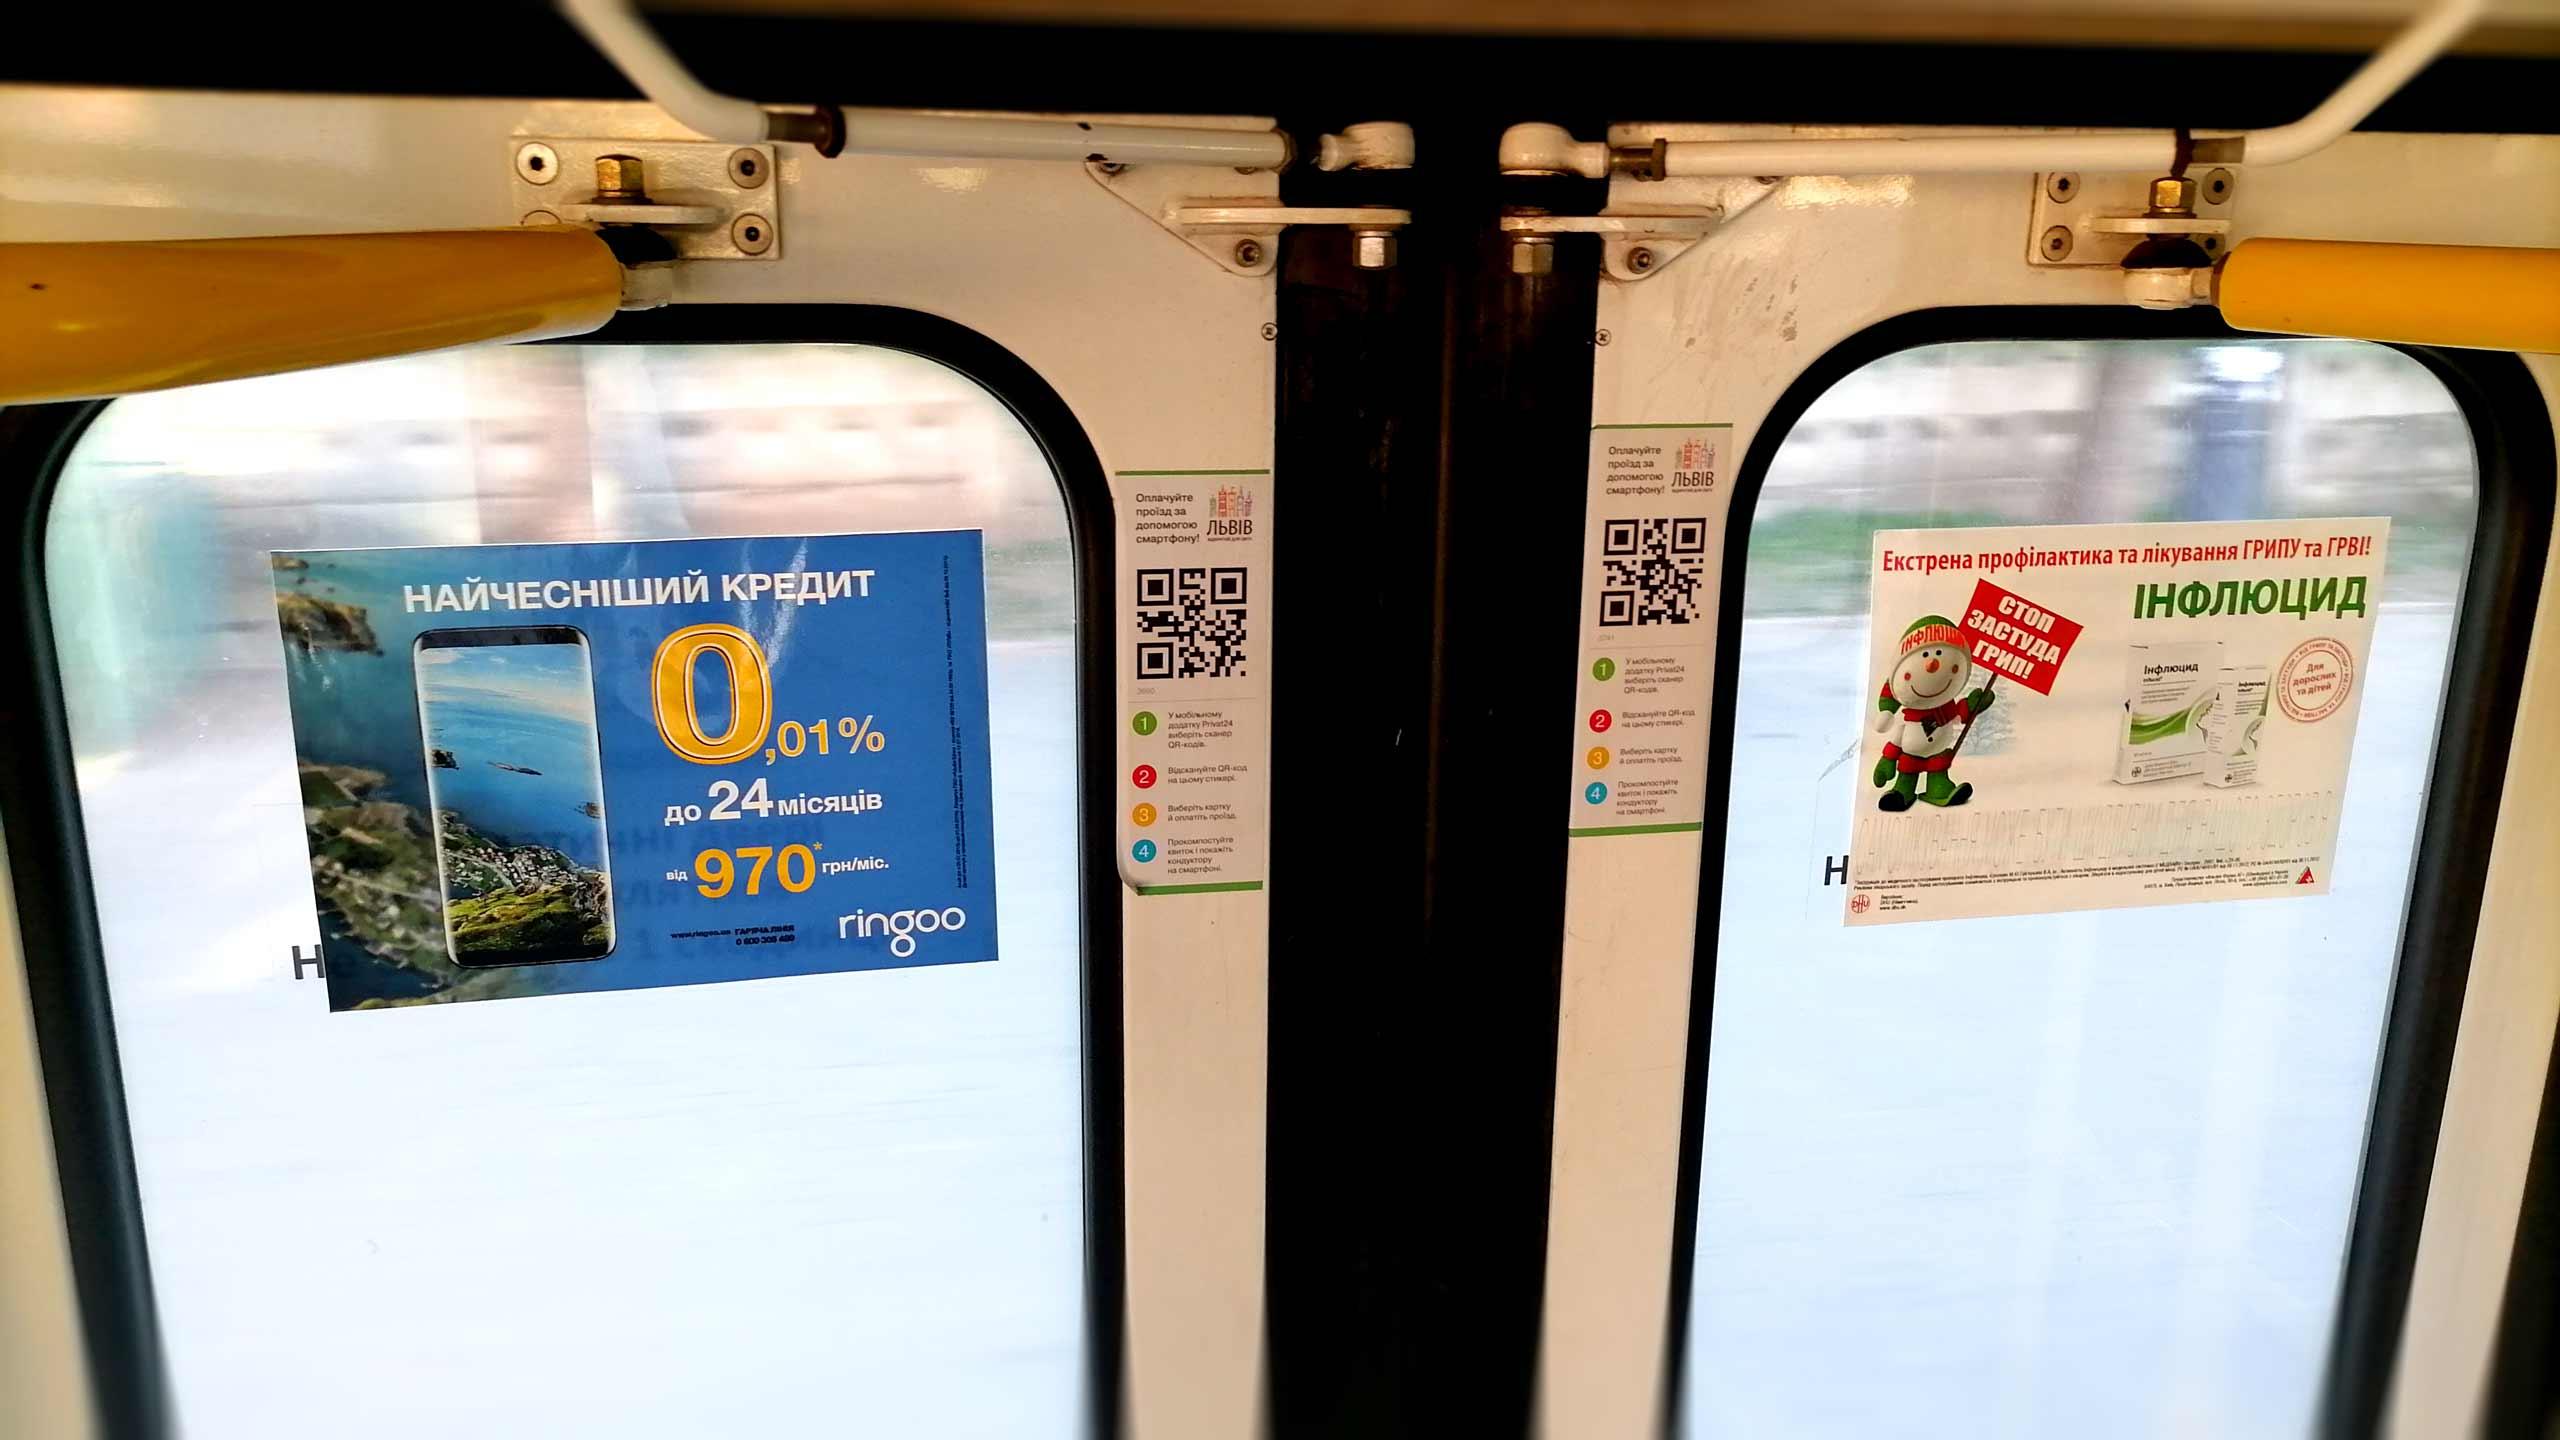 Реклама в троллейбусах Винница